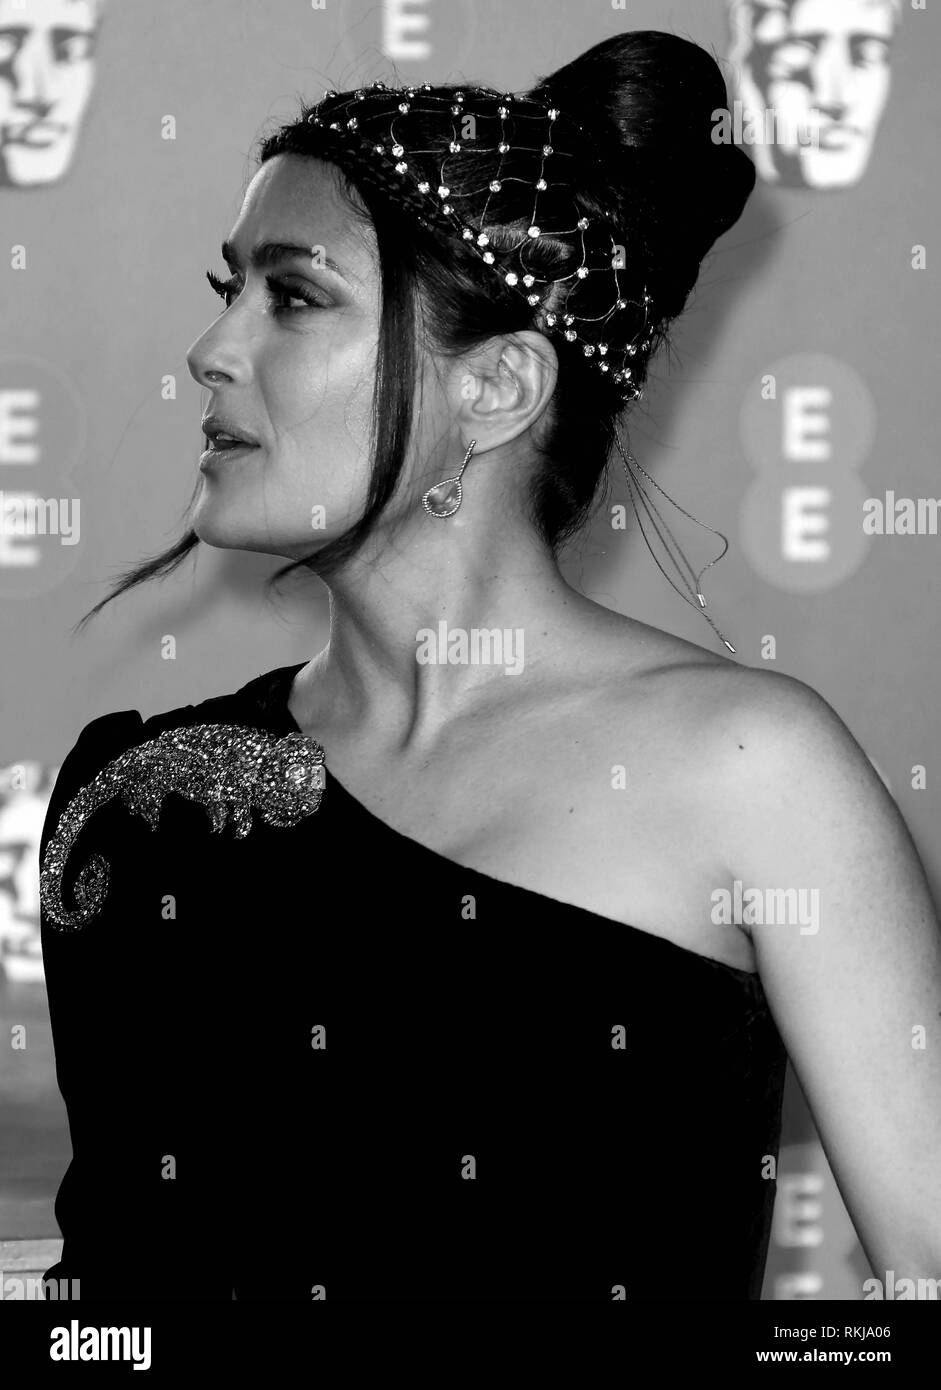 Feb 10, 2019 - Salma Hayek an EE British Academy Film Awards 2019 - Alternative Ansicht, der Royal Albert Hall in London, Großbritannien Stockbild